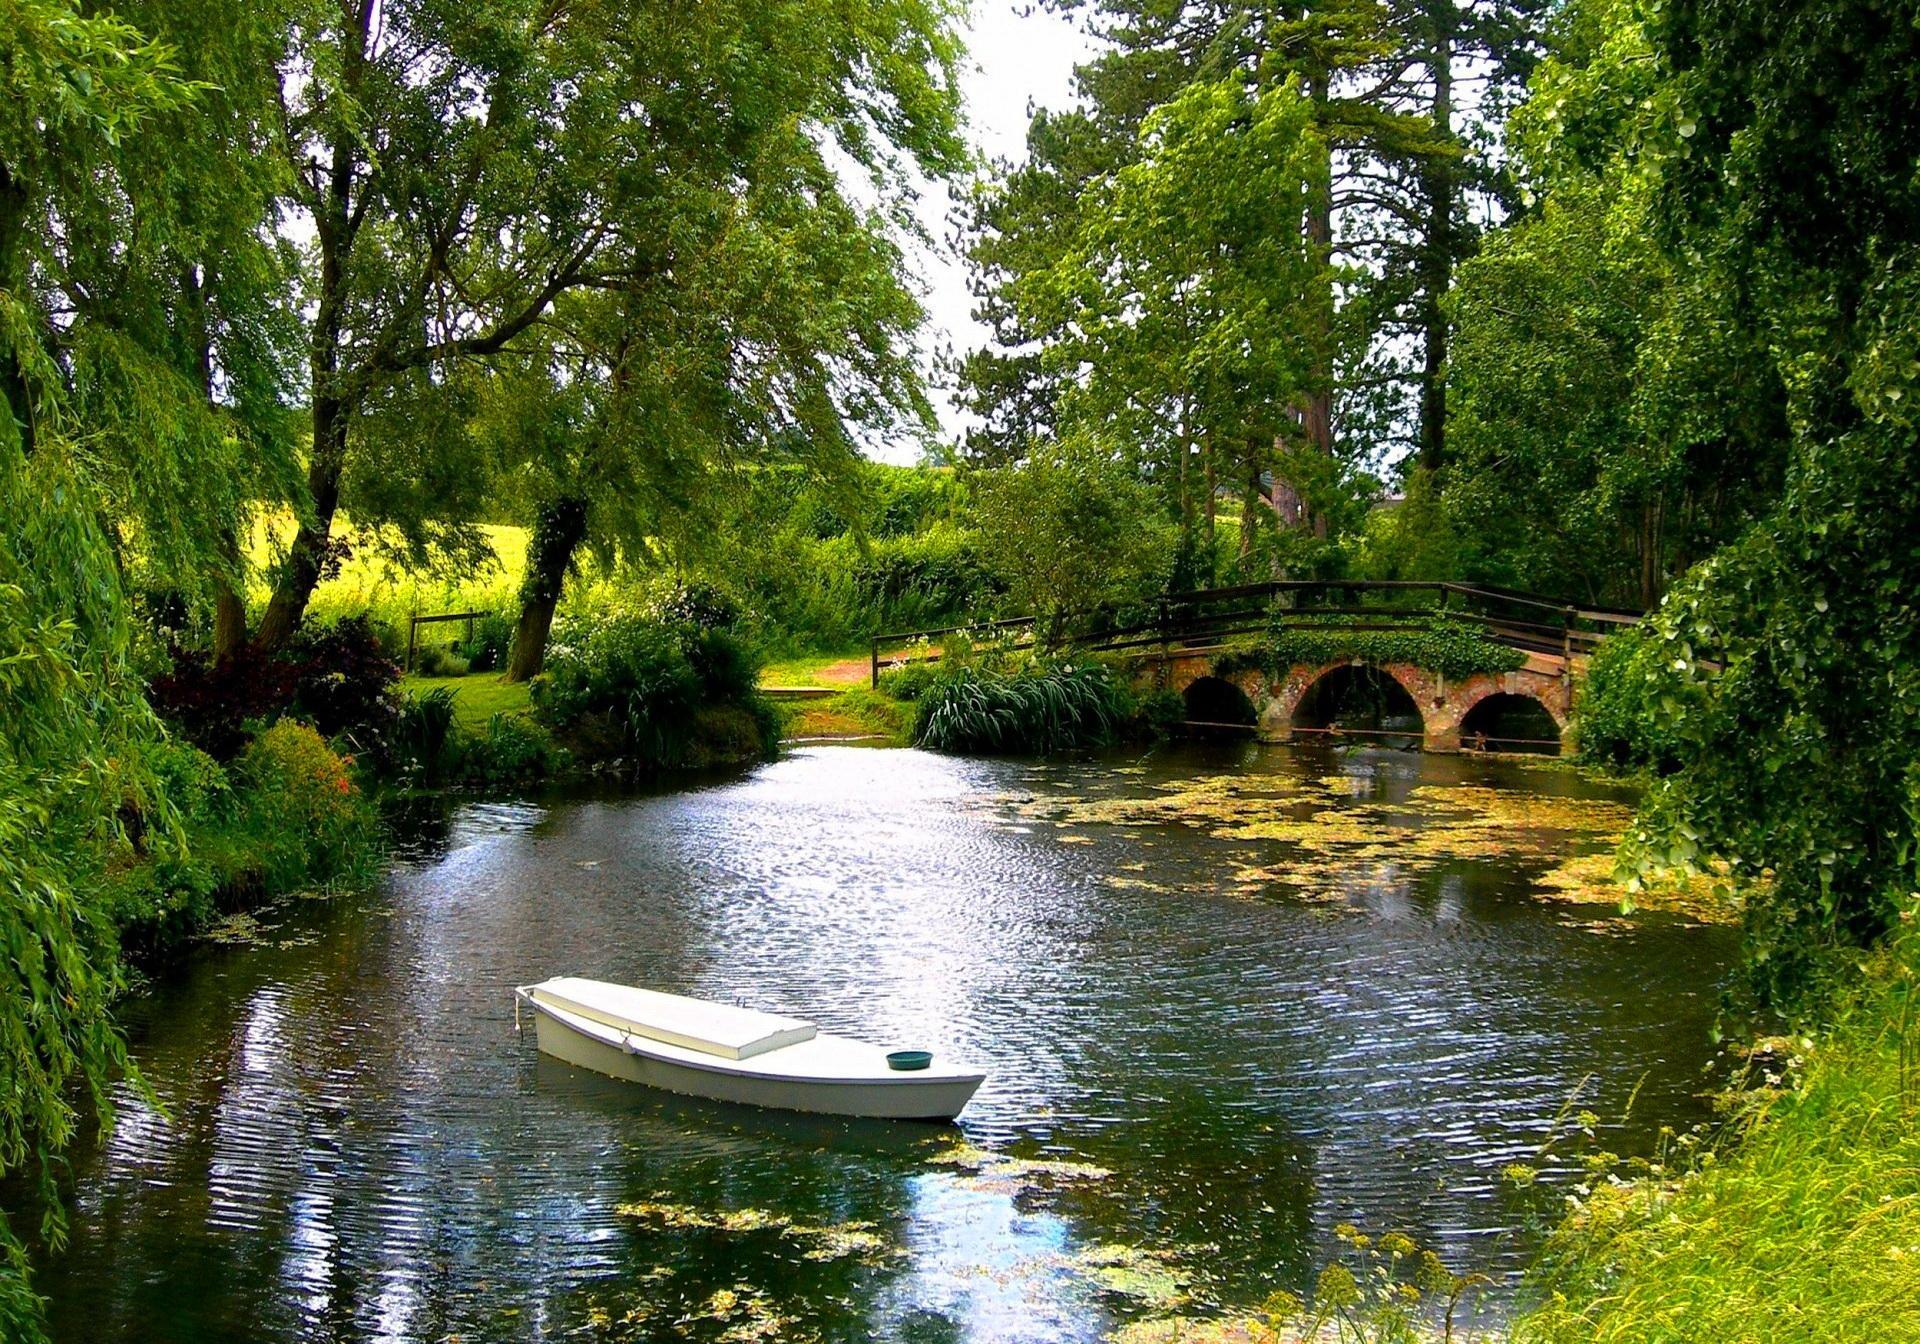 Cute Tardis Wallpaper Small Bridge Over The Pond Wallpaper Nature And